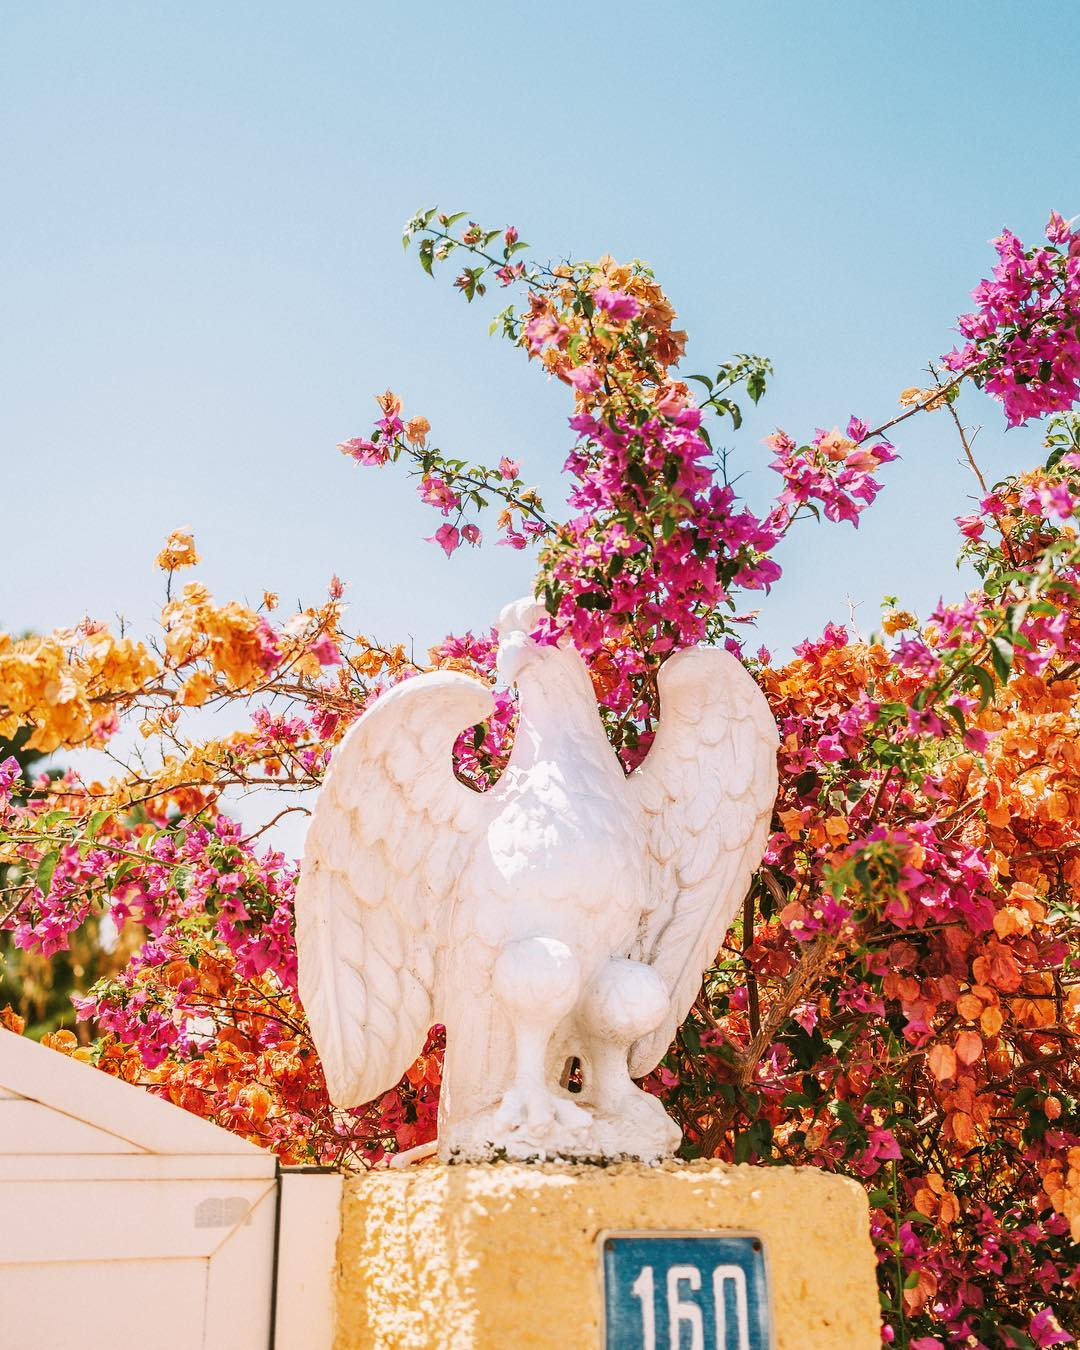 fotografo Joaquin Lucas paleta de colores de Wes Anderson  (71)